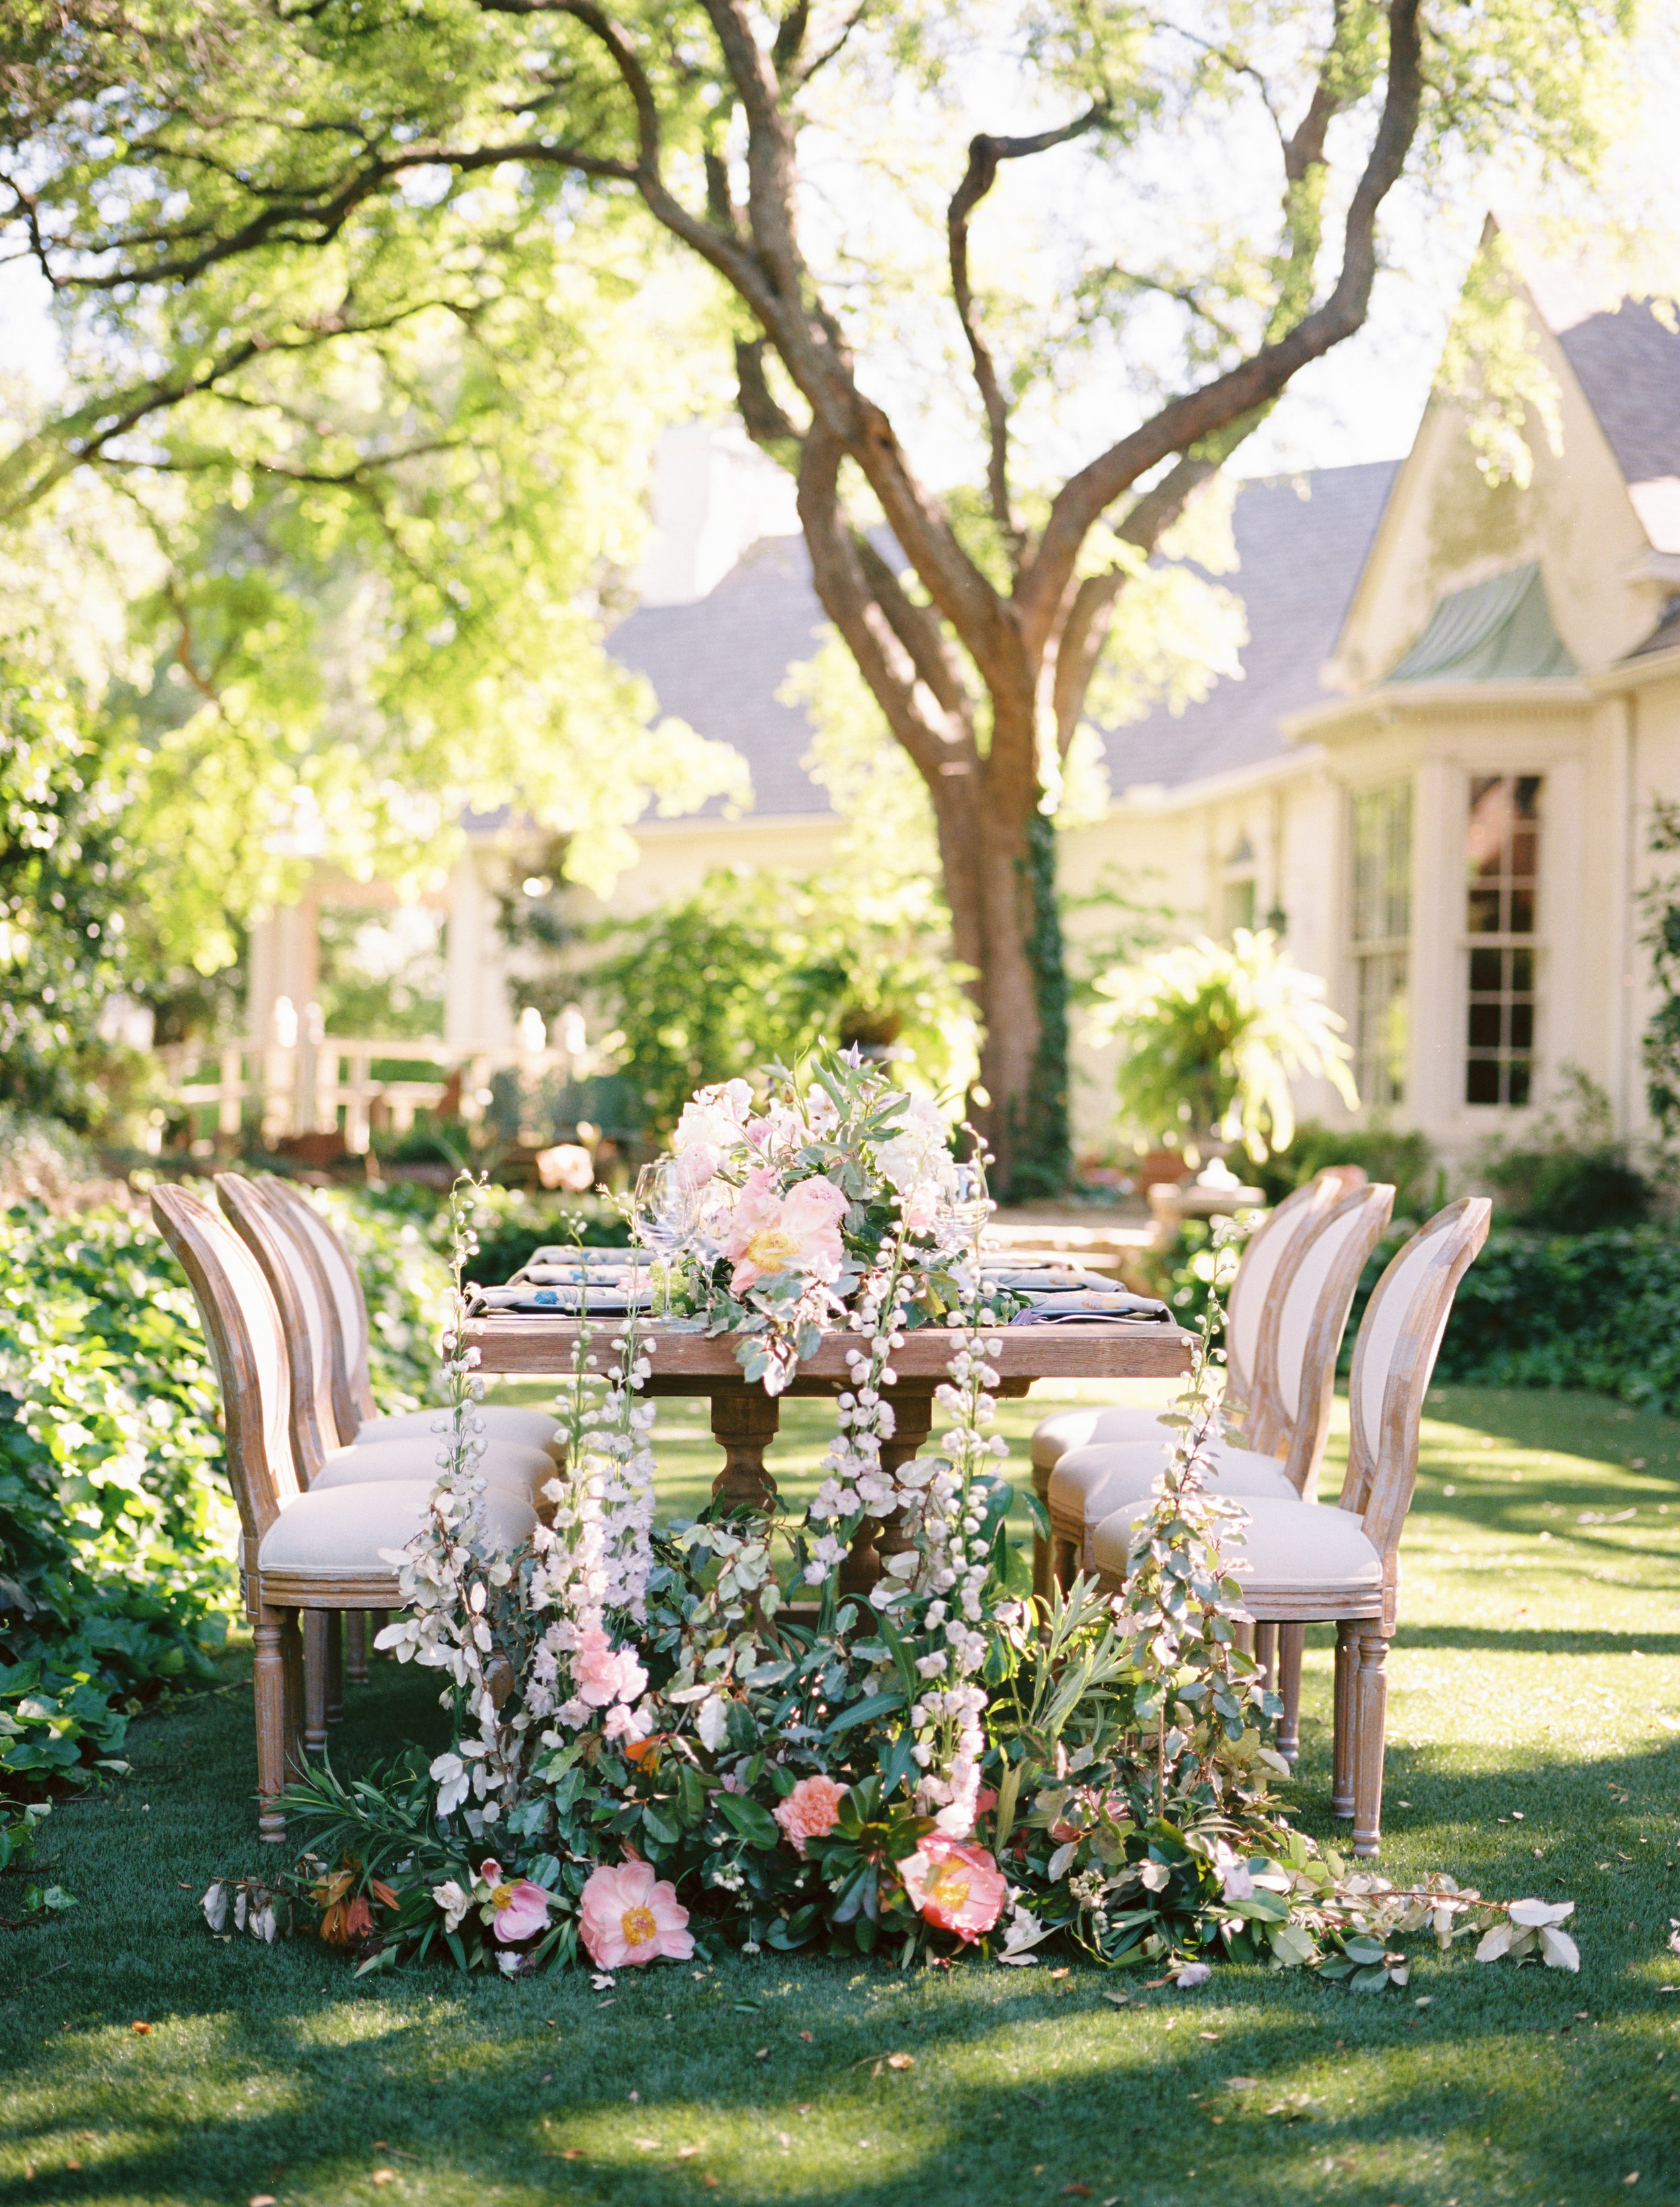 Elegant bohemian garden wedding inspiration featured in   Green Wedding Shoes